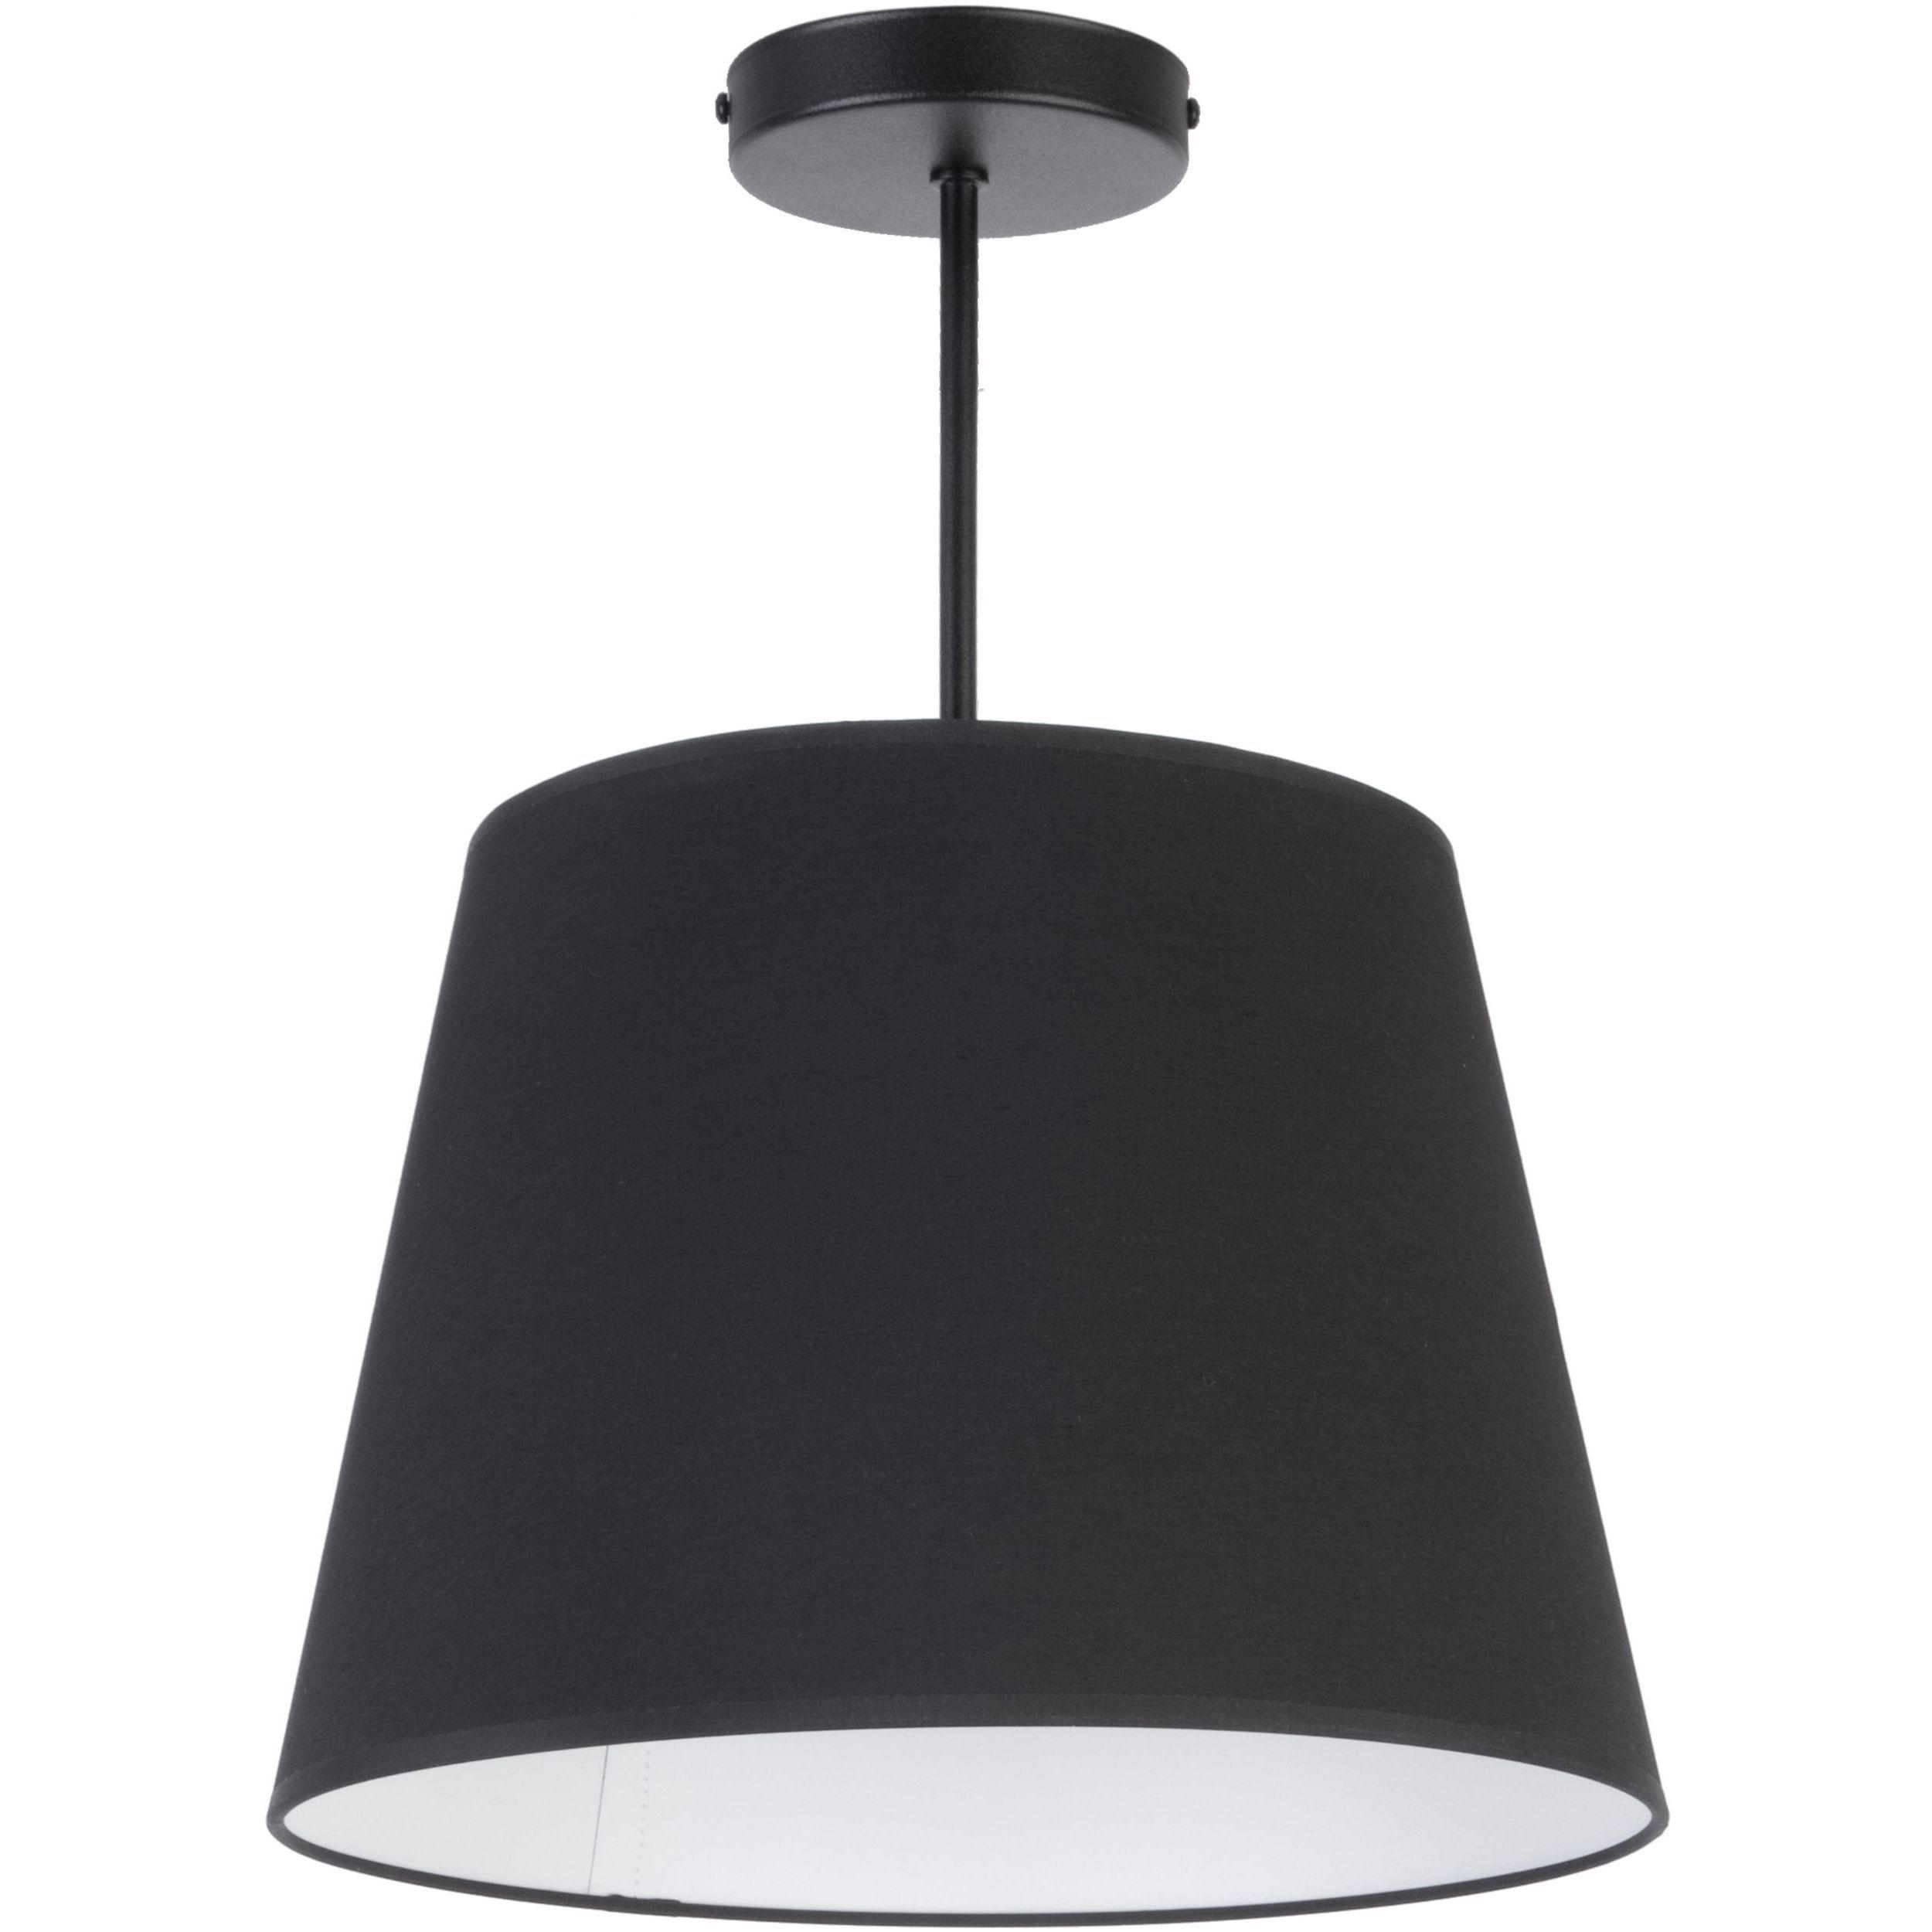 Lampa sufitowa Sigma Febe x1 Czarny